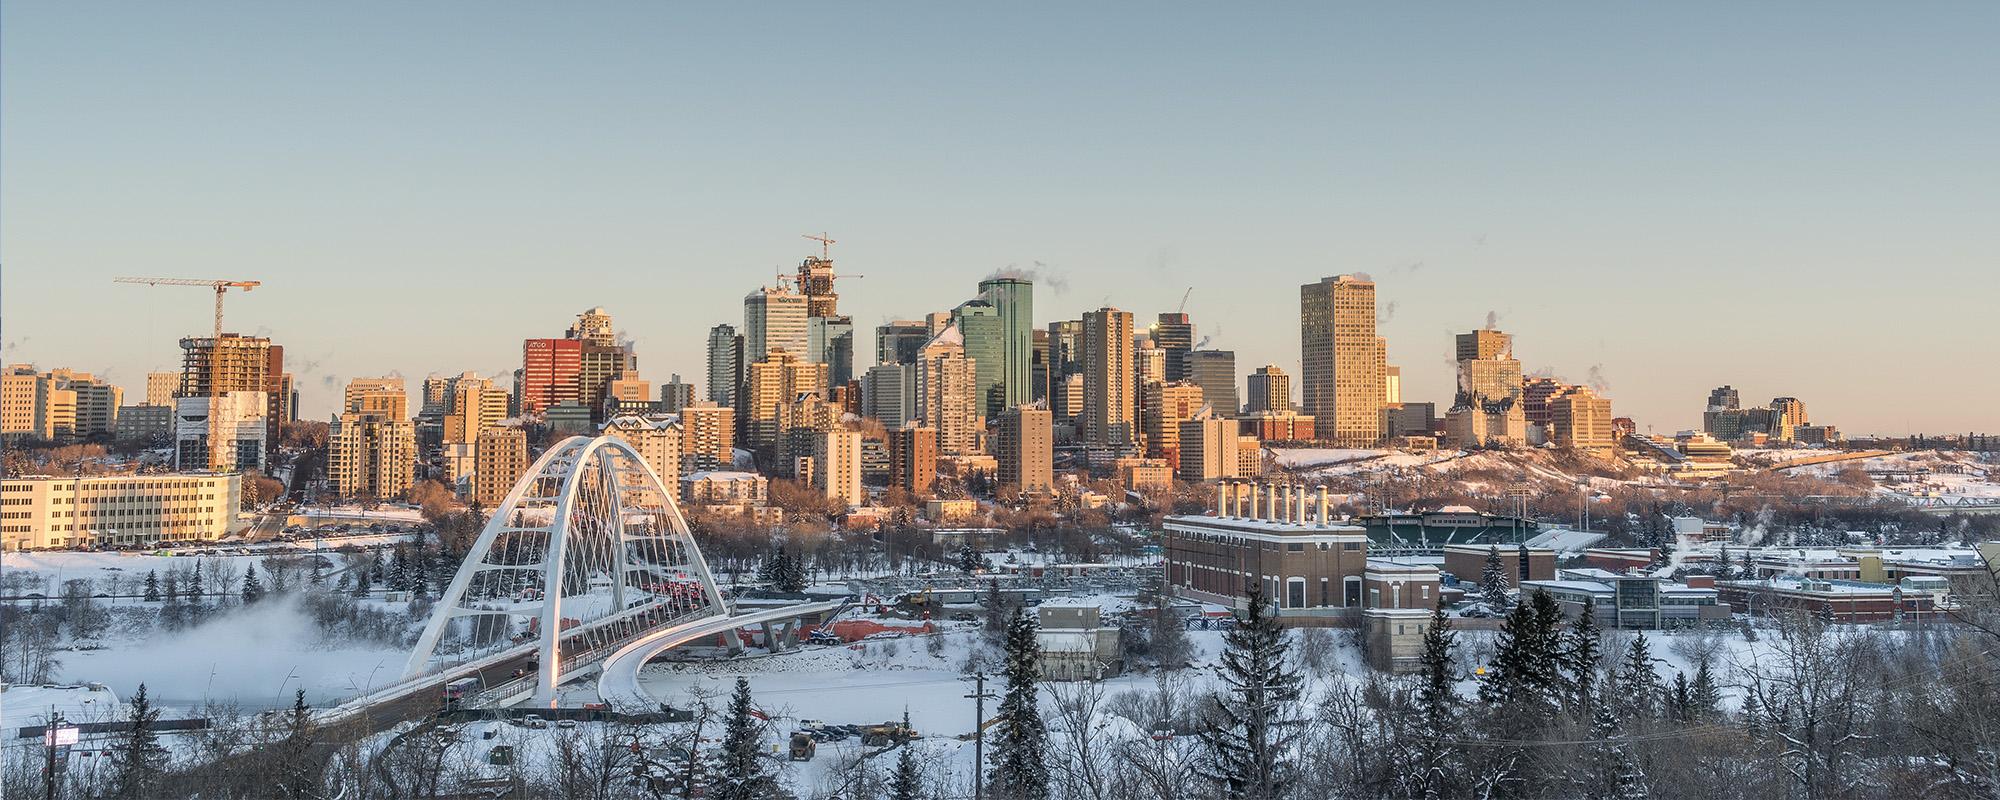 Edmonton, Kanada | ScheesichereDeals.de